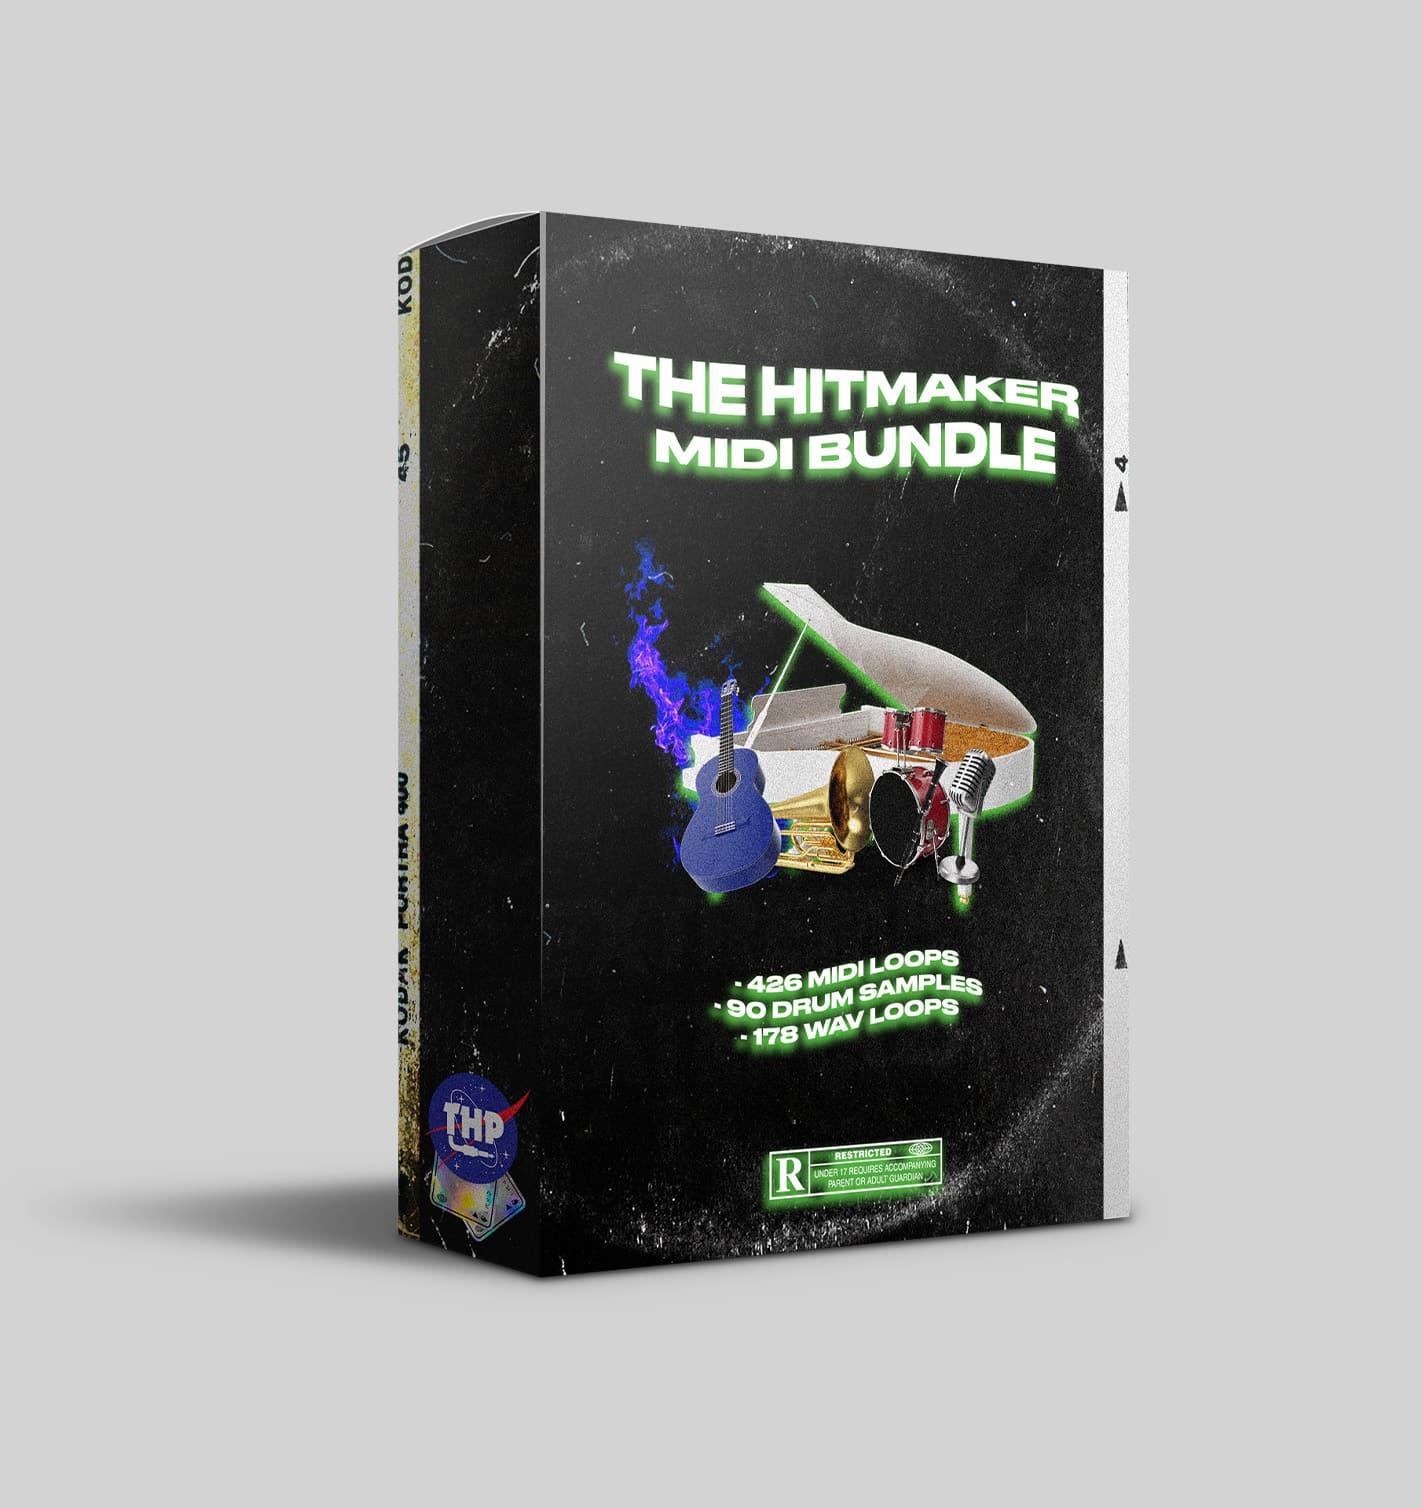 Discover The Hitmaker Midi Bundle